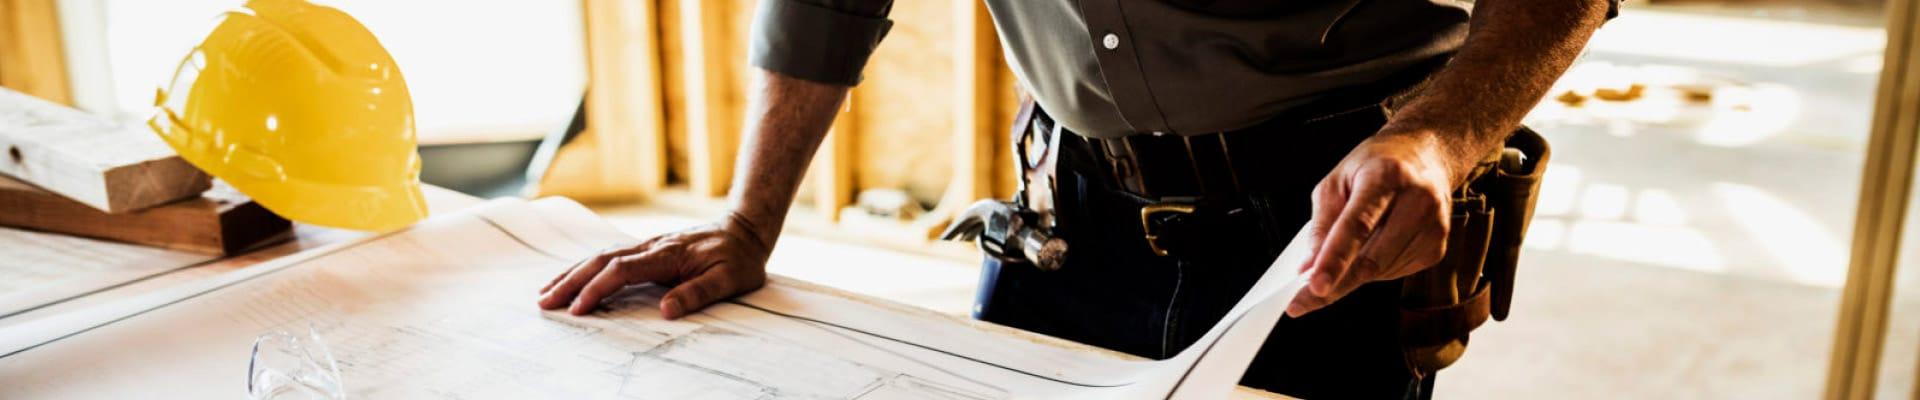 Subcontractors | Apply to be a Subcontractor | Drulyk Construction